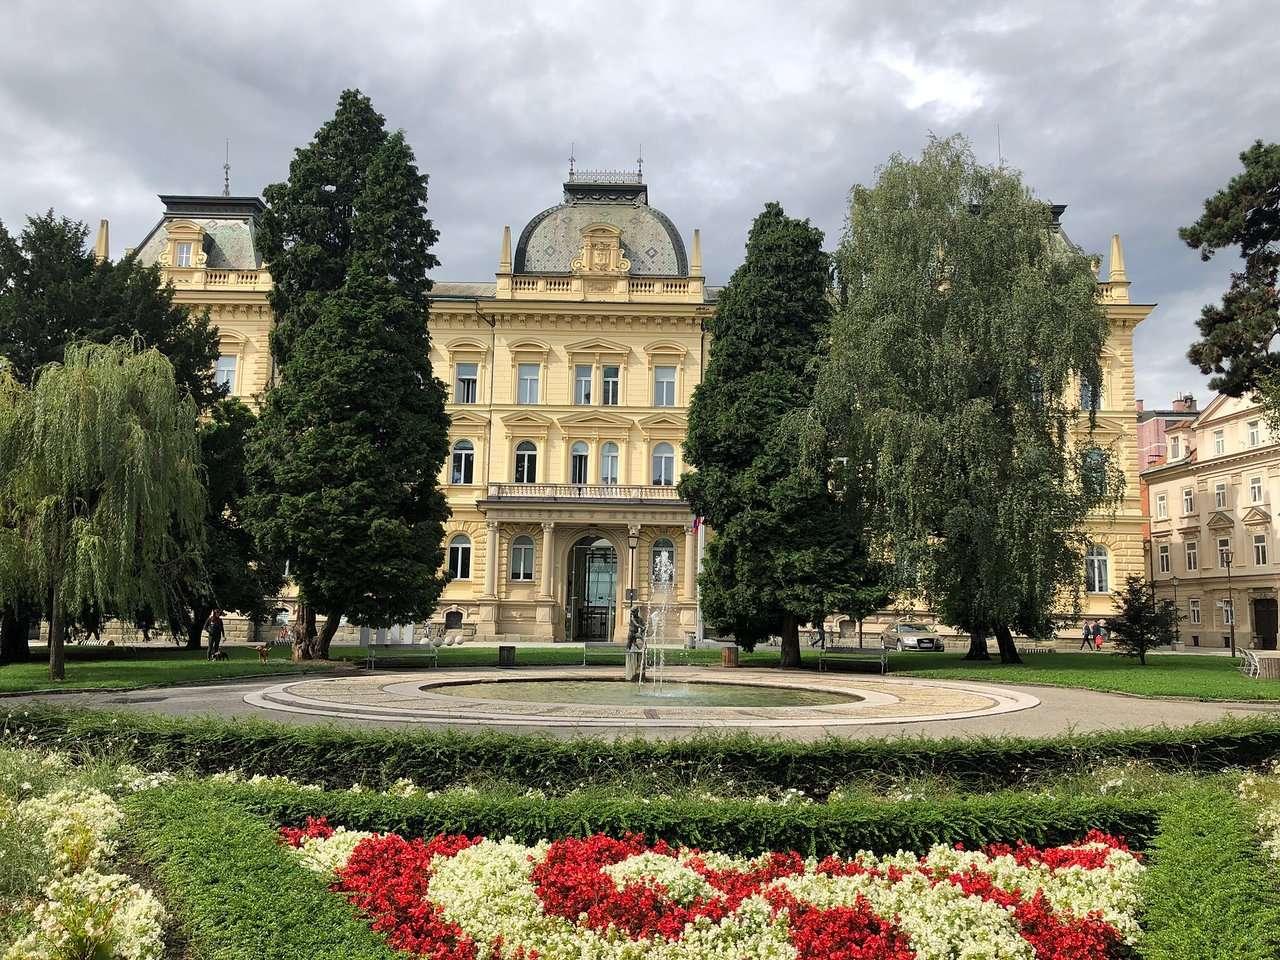 Maribor stad i Kroatien (14×11)